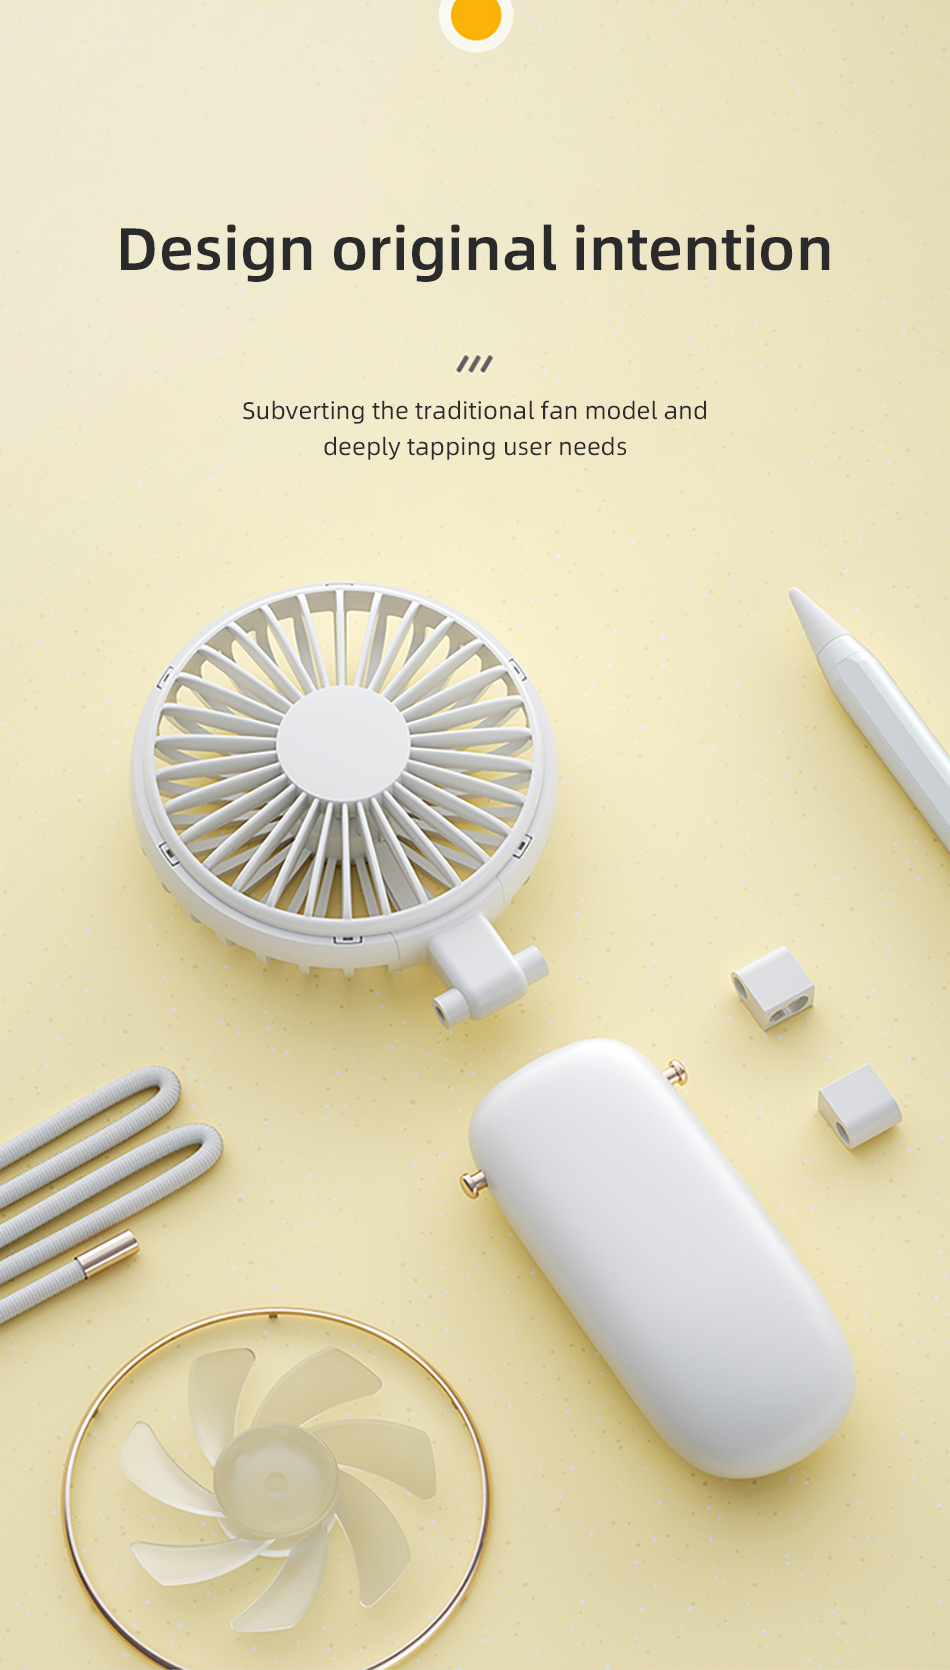 Benks F16 Mini USB Fans Mobile Handheld Fan Hanging Neck Lazy Outdoor Fan Air Cooler Rechargeable Foldable Desktop Office Fans (3)